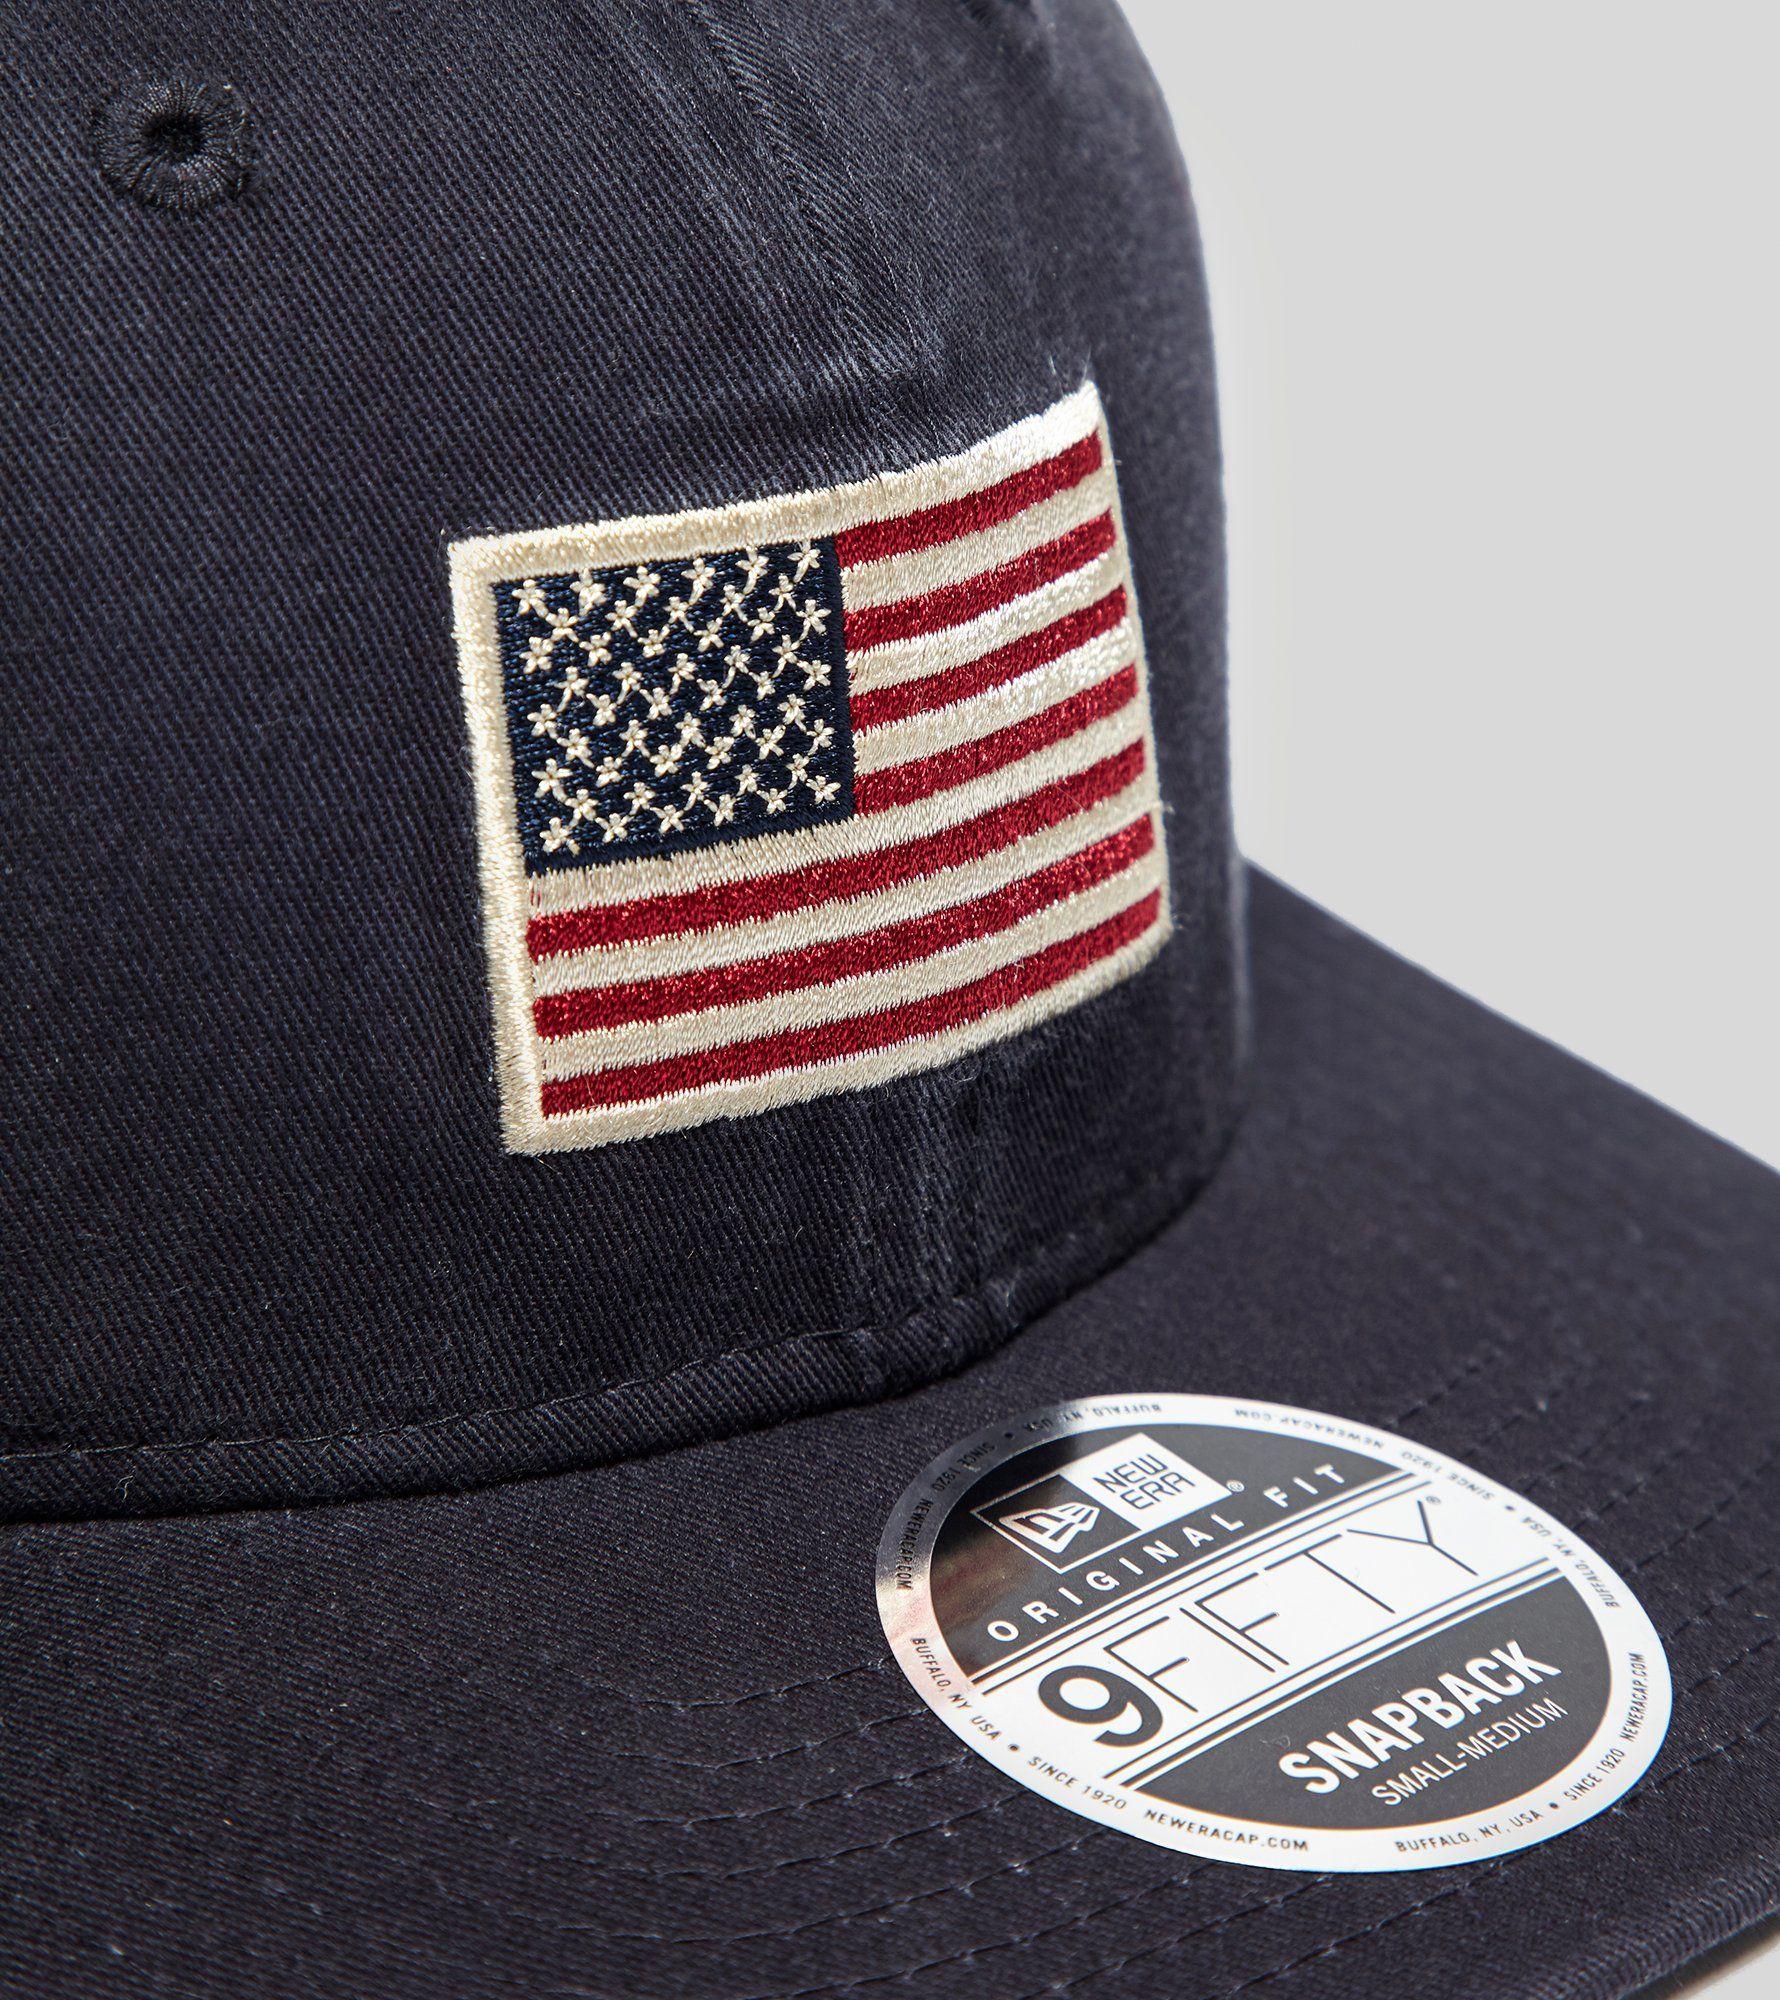 New Era 9FIFTY USA Flag Cap